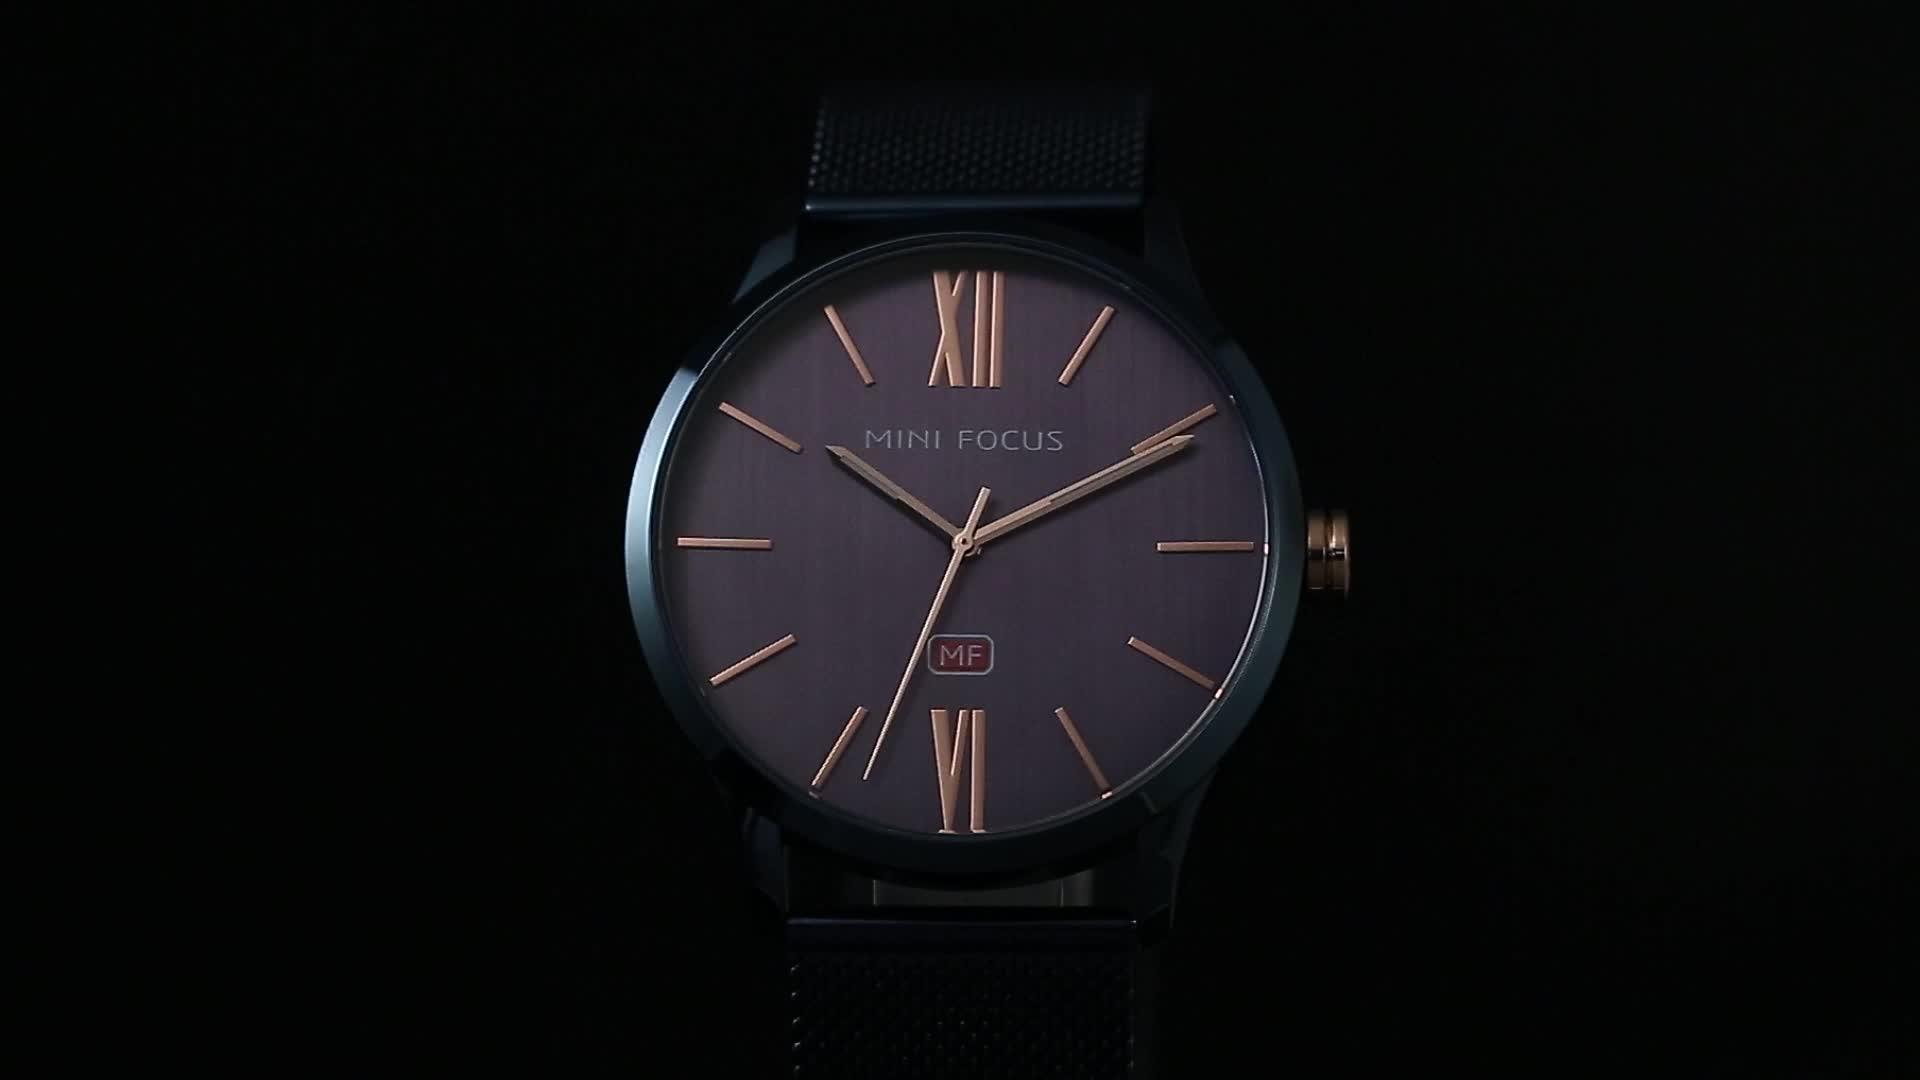 Mini Focus Merk Uw Eigen Logo Mannen Quartz Analoog Polshorloge met Mesh Band Gratis Sample reloj horloge